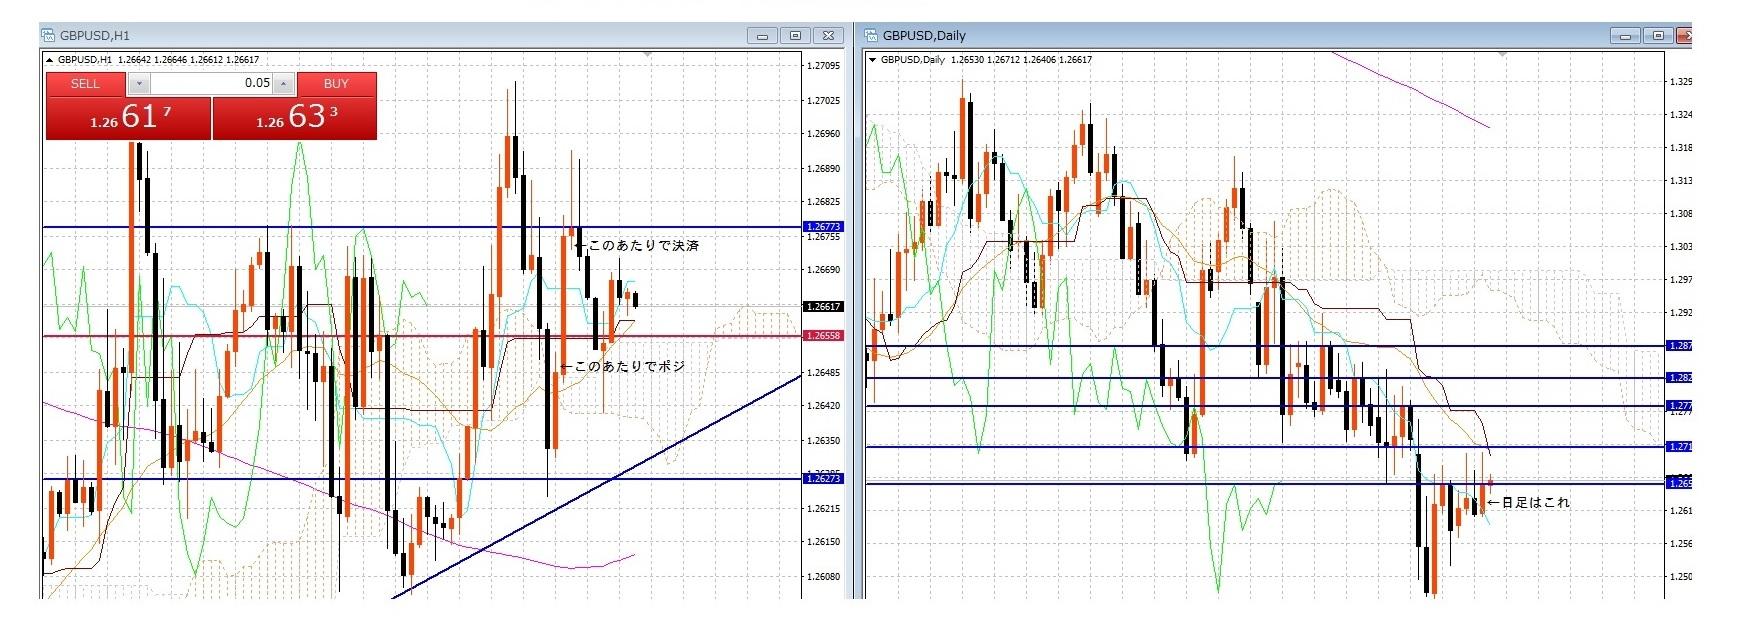 FBS-Trading-初陣-GBP-USD-ロング-エントリーと利益確定-ポイントについて